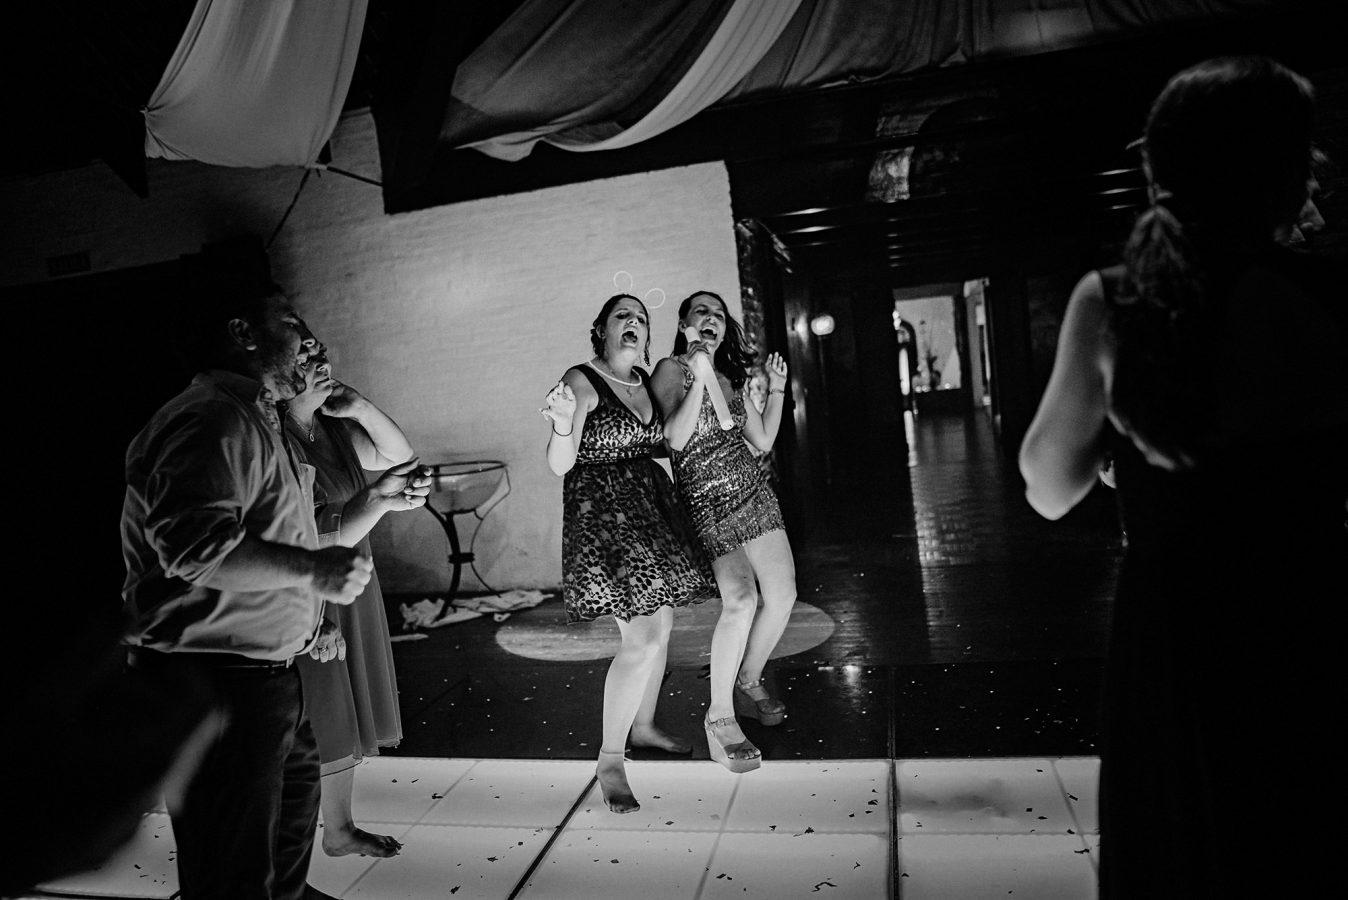 fotografos-de-boda-uruguay-15